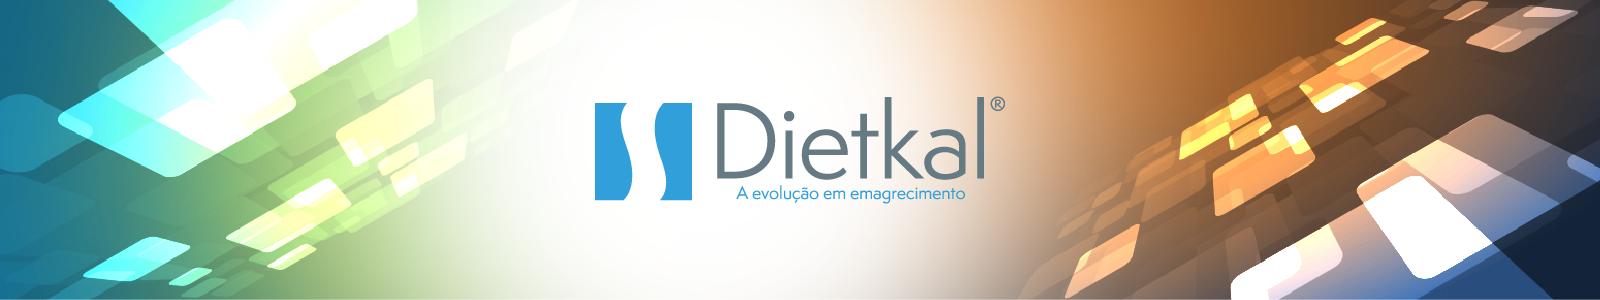 banner-dietkal